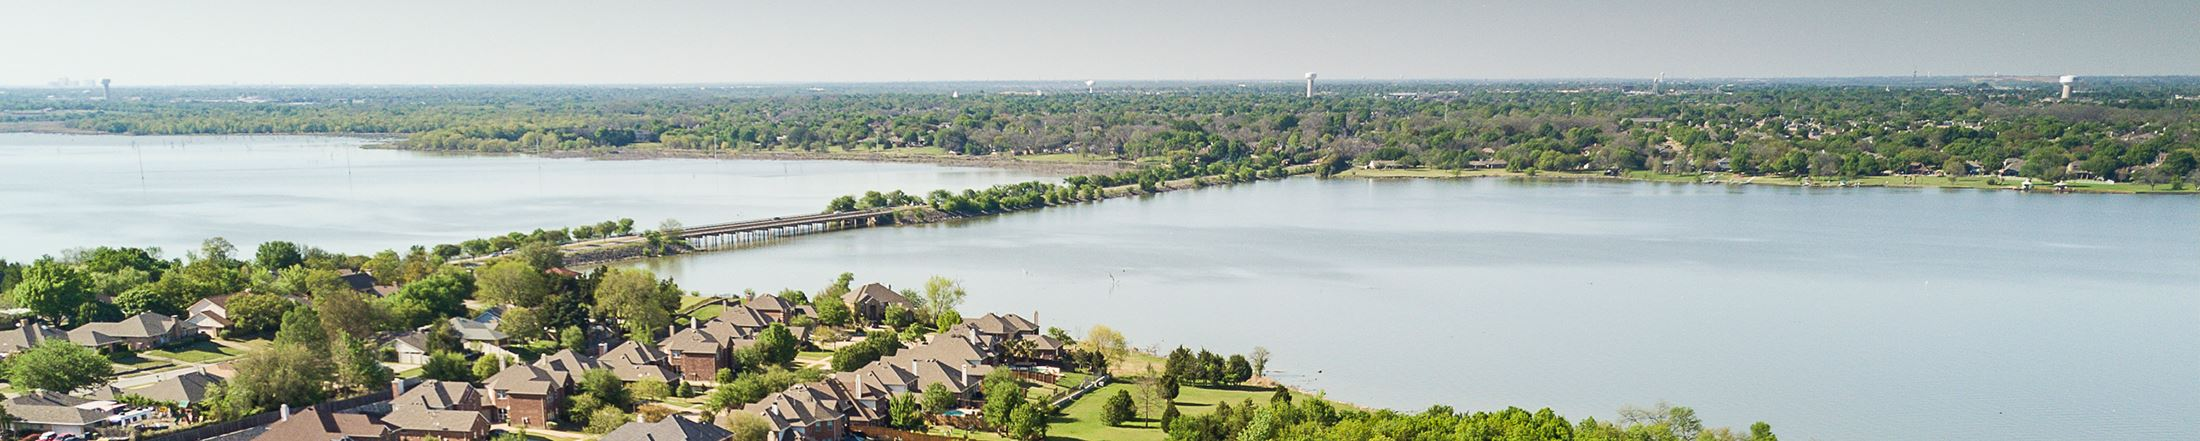 Environmental Waste Services | Garland, TX